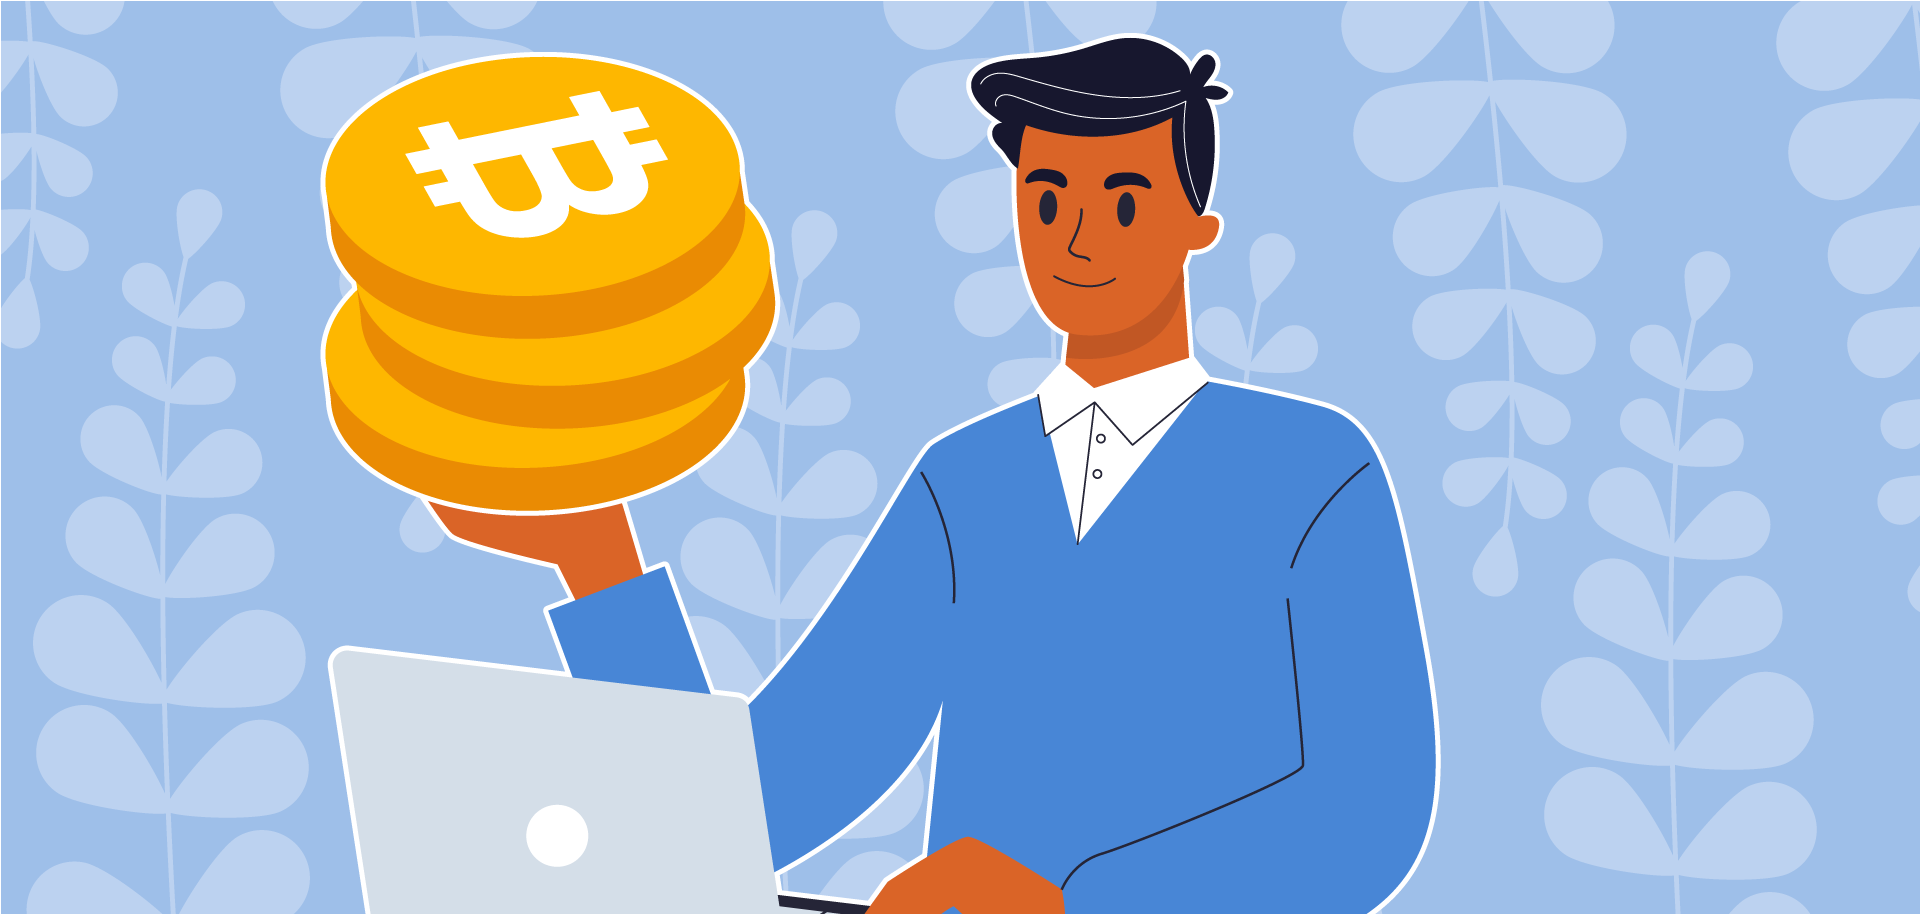 Get bitcoins without mining karnevalszug oberbettingen 2021 calendar